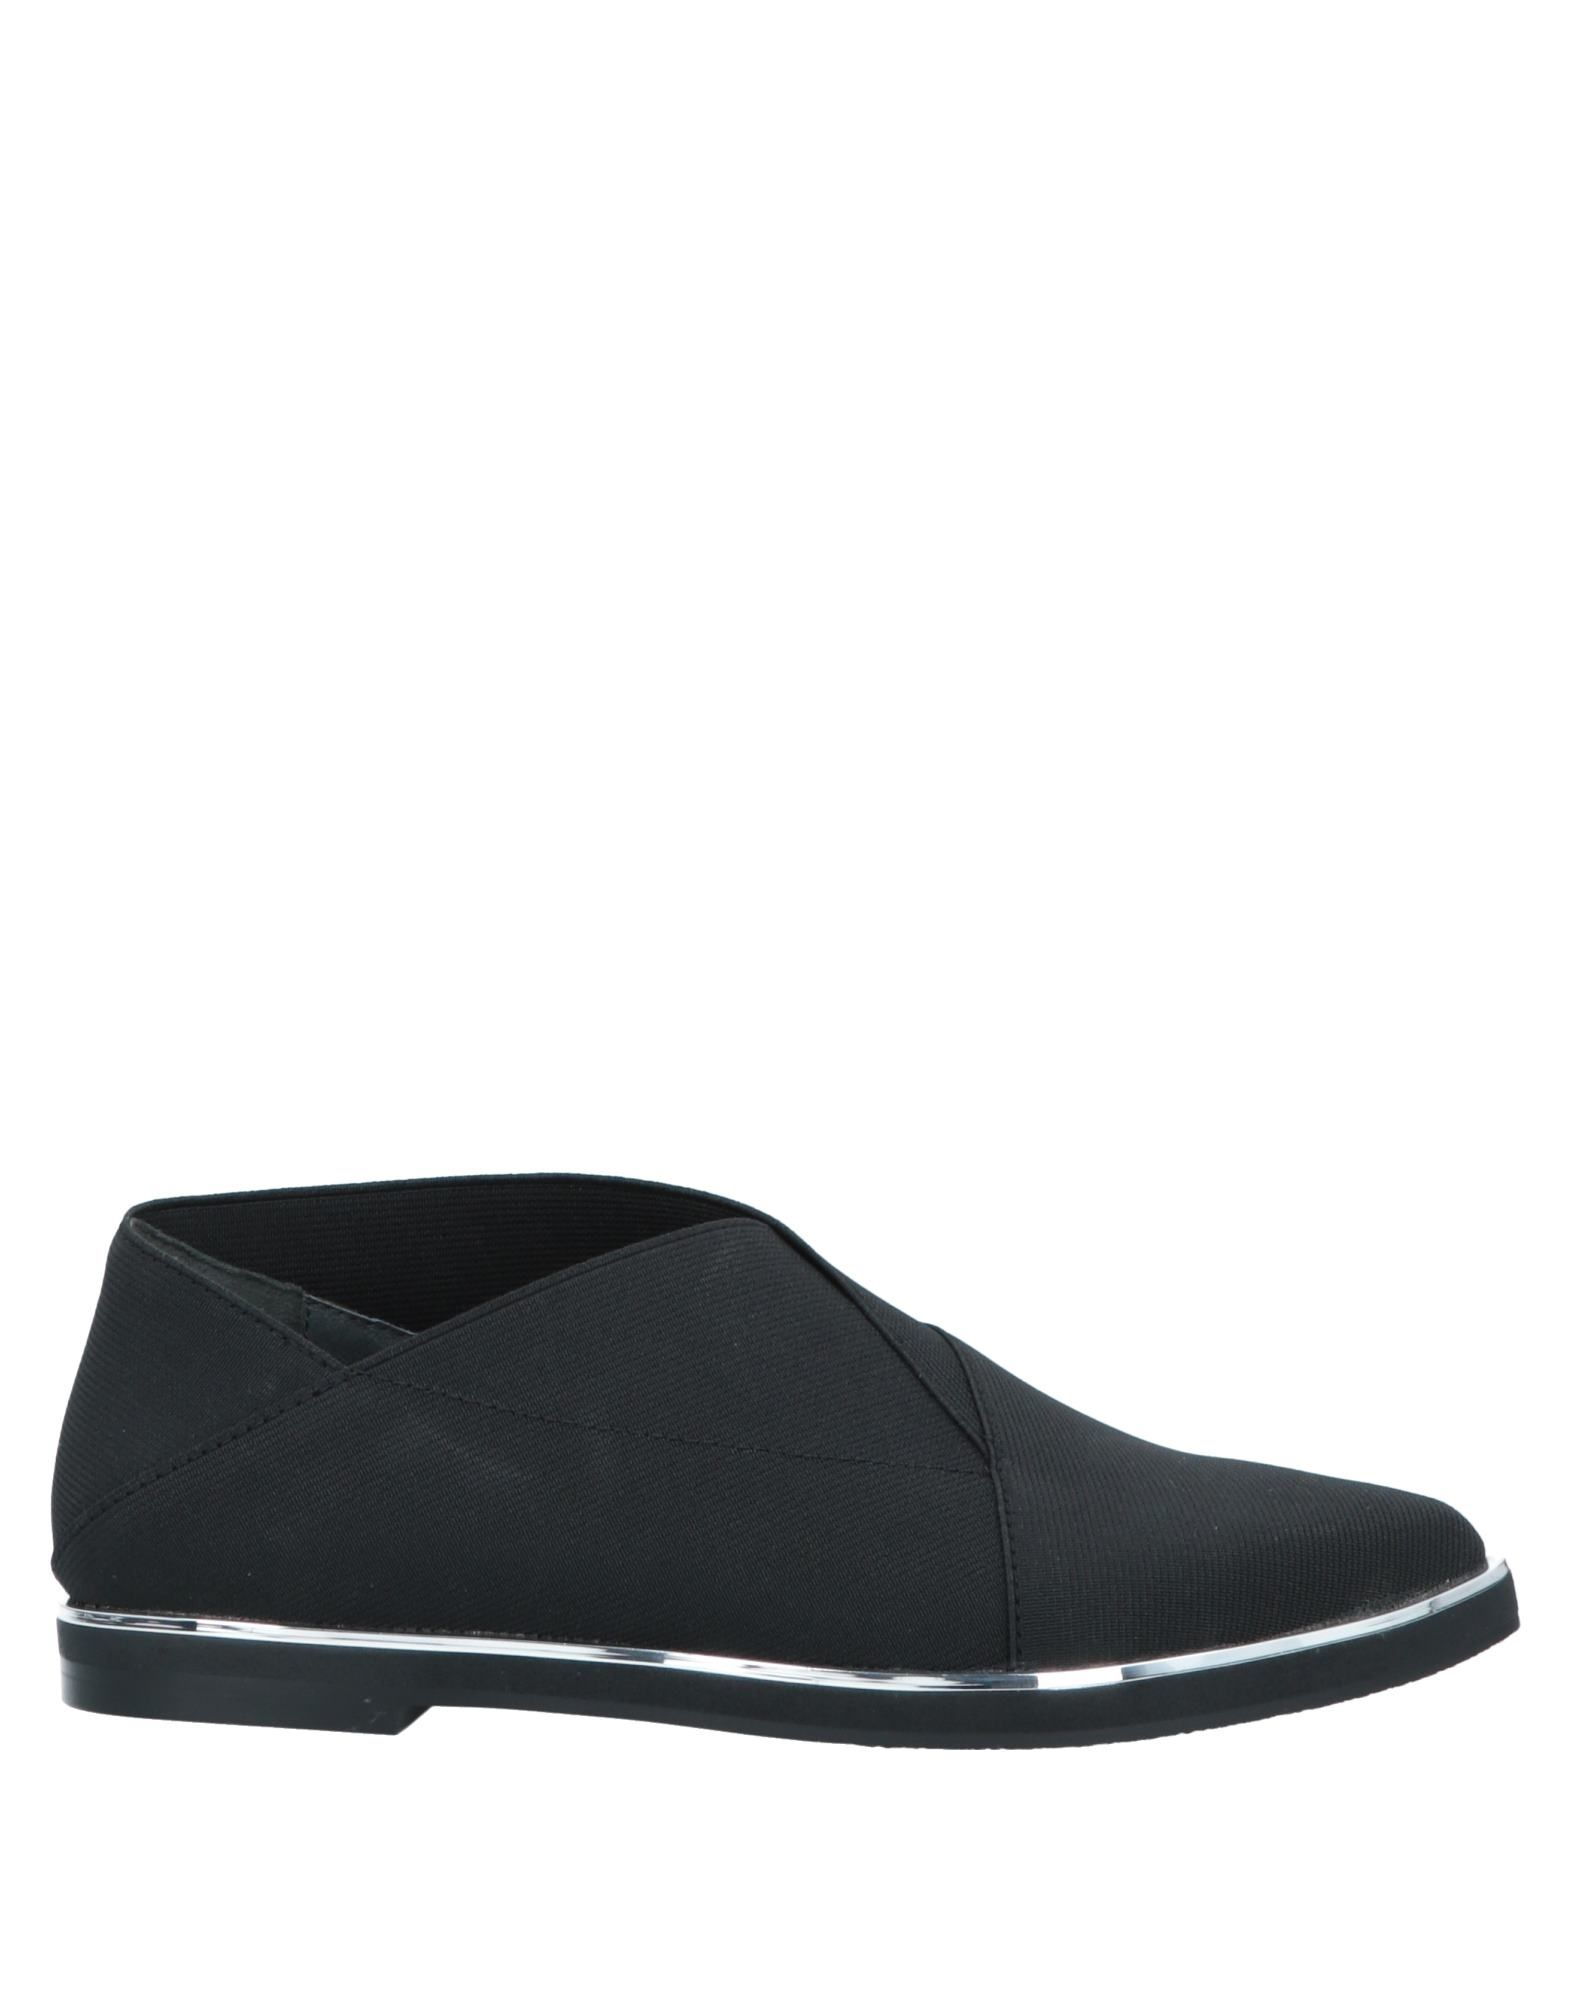 UNITED NUDE Ботинки ботинки xti ботинки без каблука